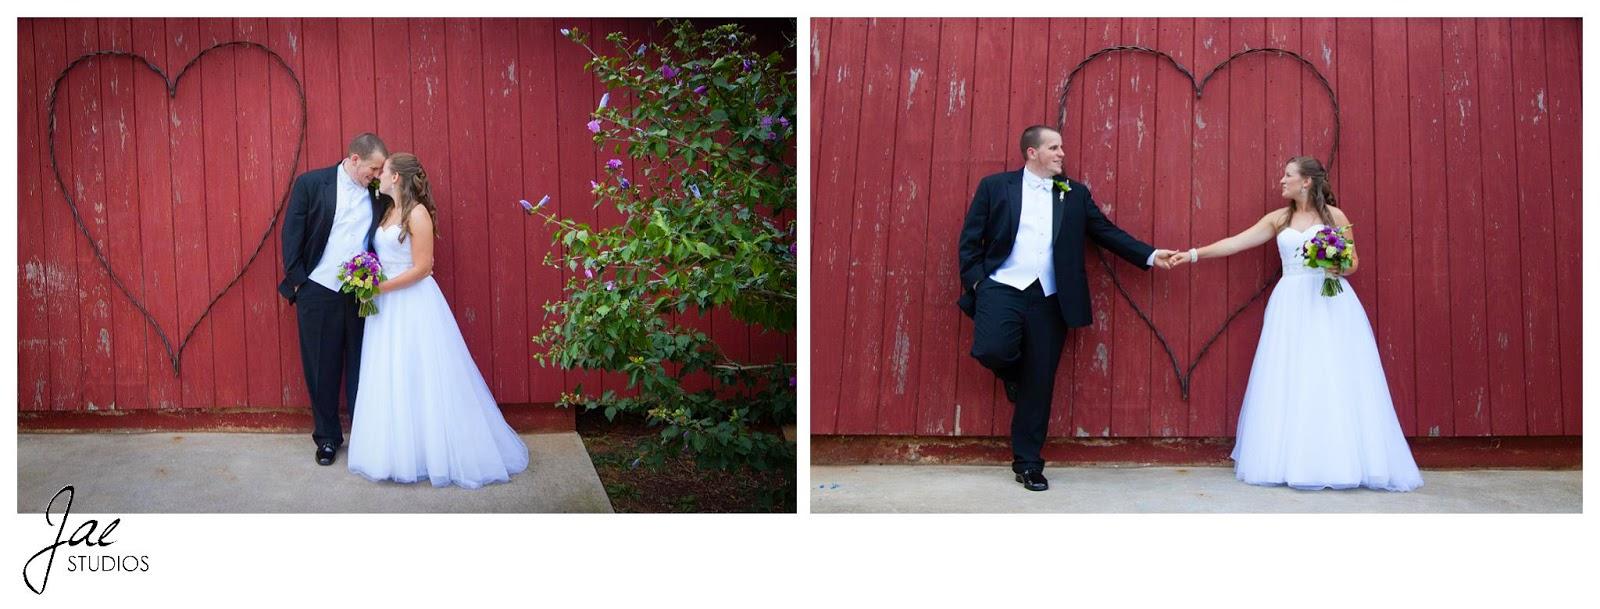 Jonathan and Julie, Bird cage, West Manor Estate, Wedding, Lynchburg, Virginia, Jae Studios, red door, barn, flowers, heart, wedding dress, tuxedo, flowers, bouquet, holding hands, hugging